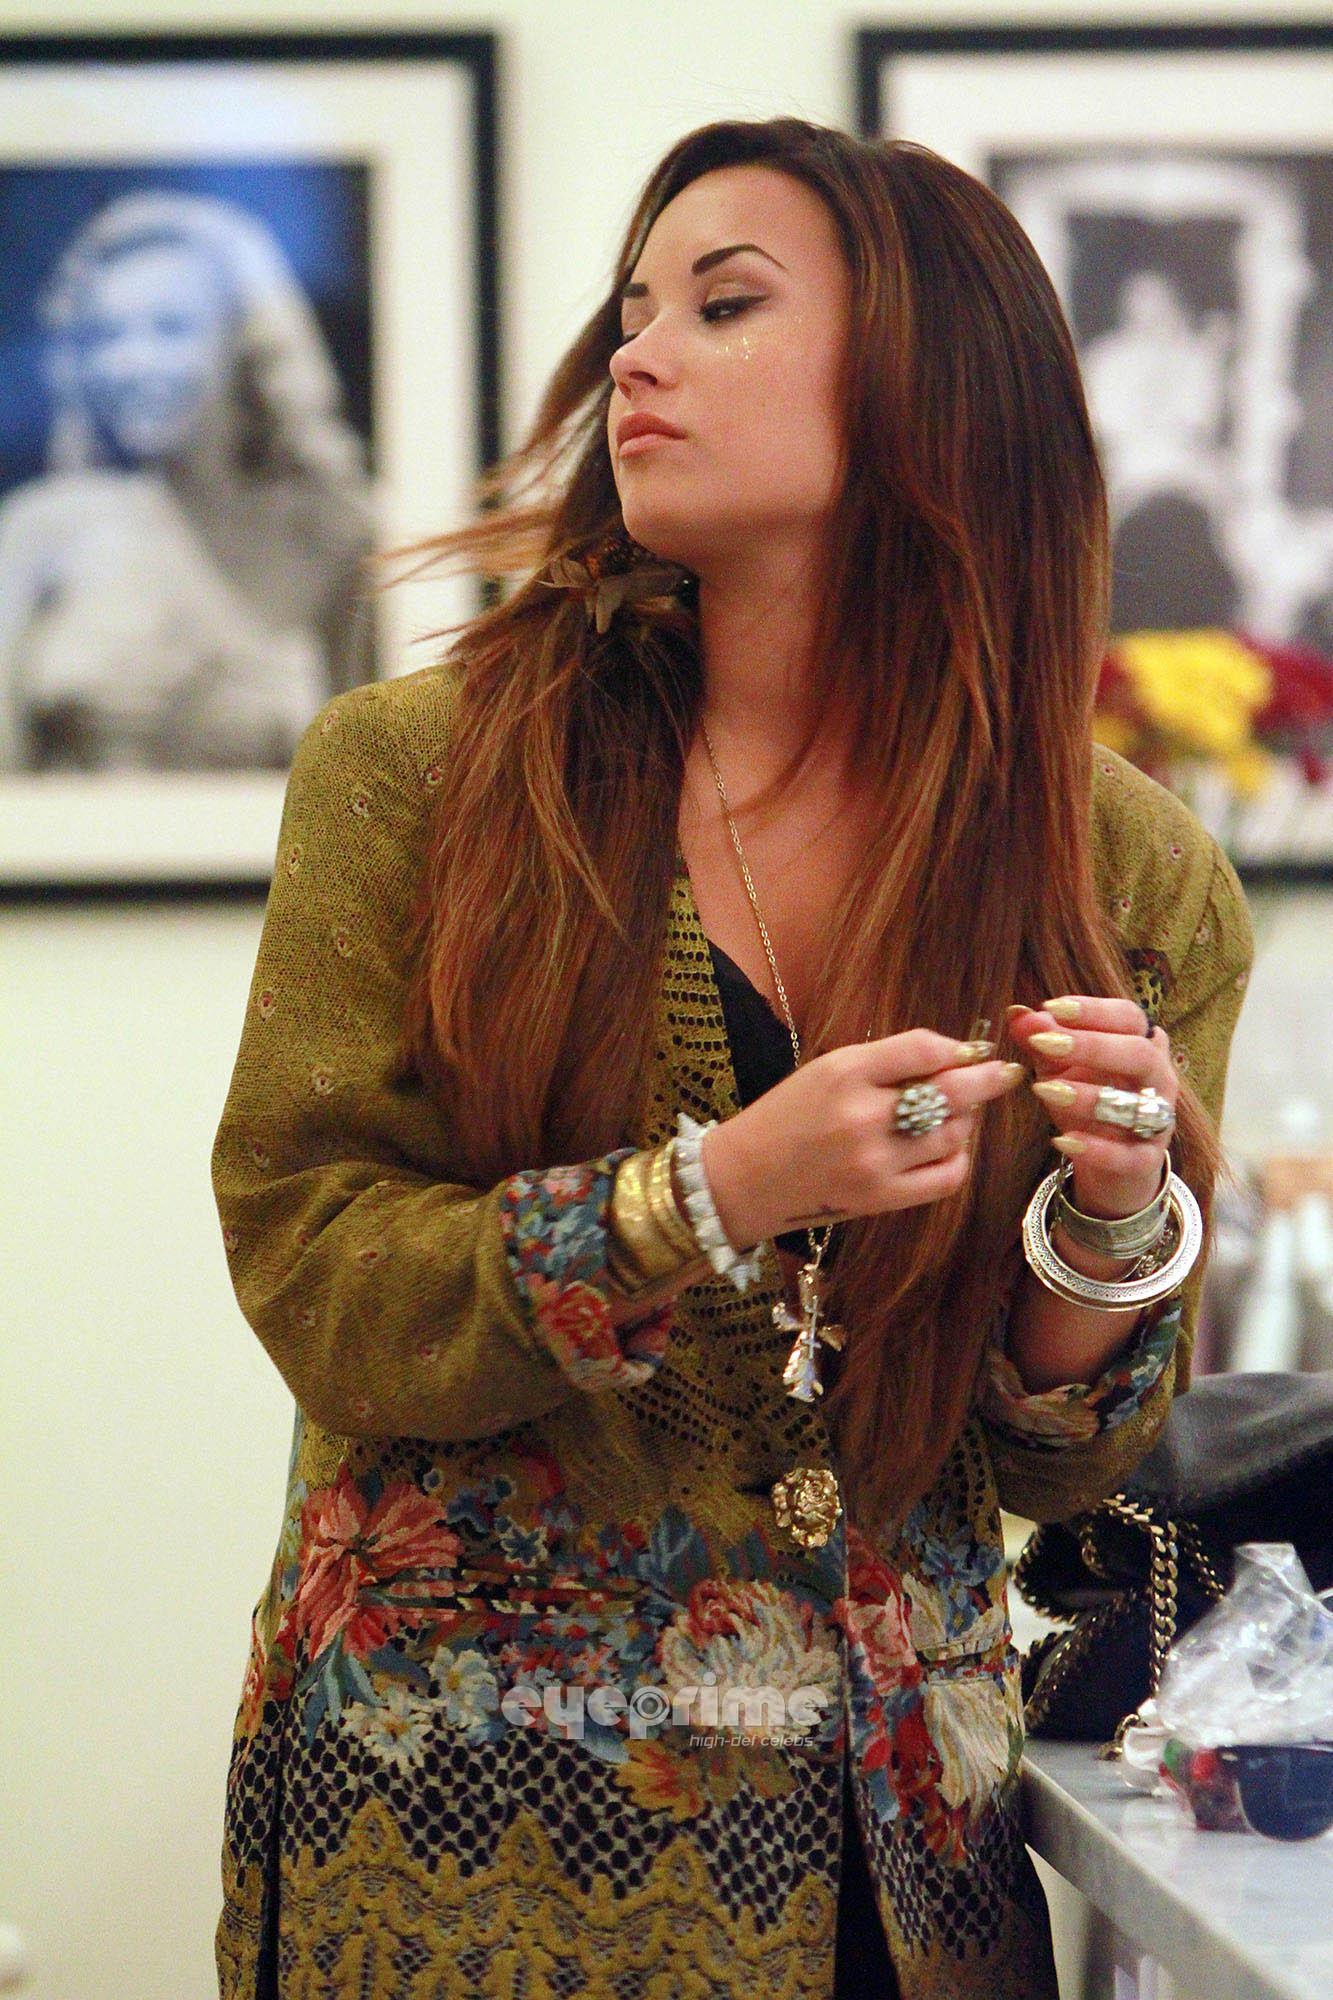 Demi Lovato out in Los Angeles, August 2 - demi-lovato photo